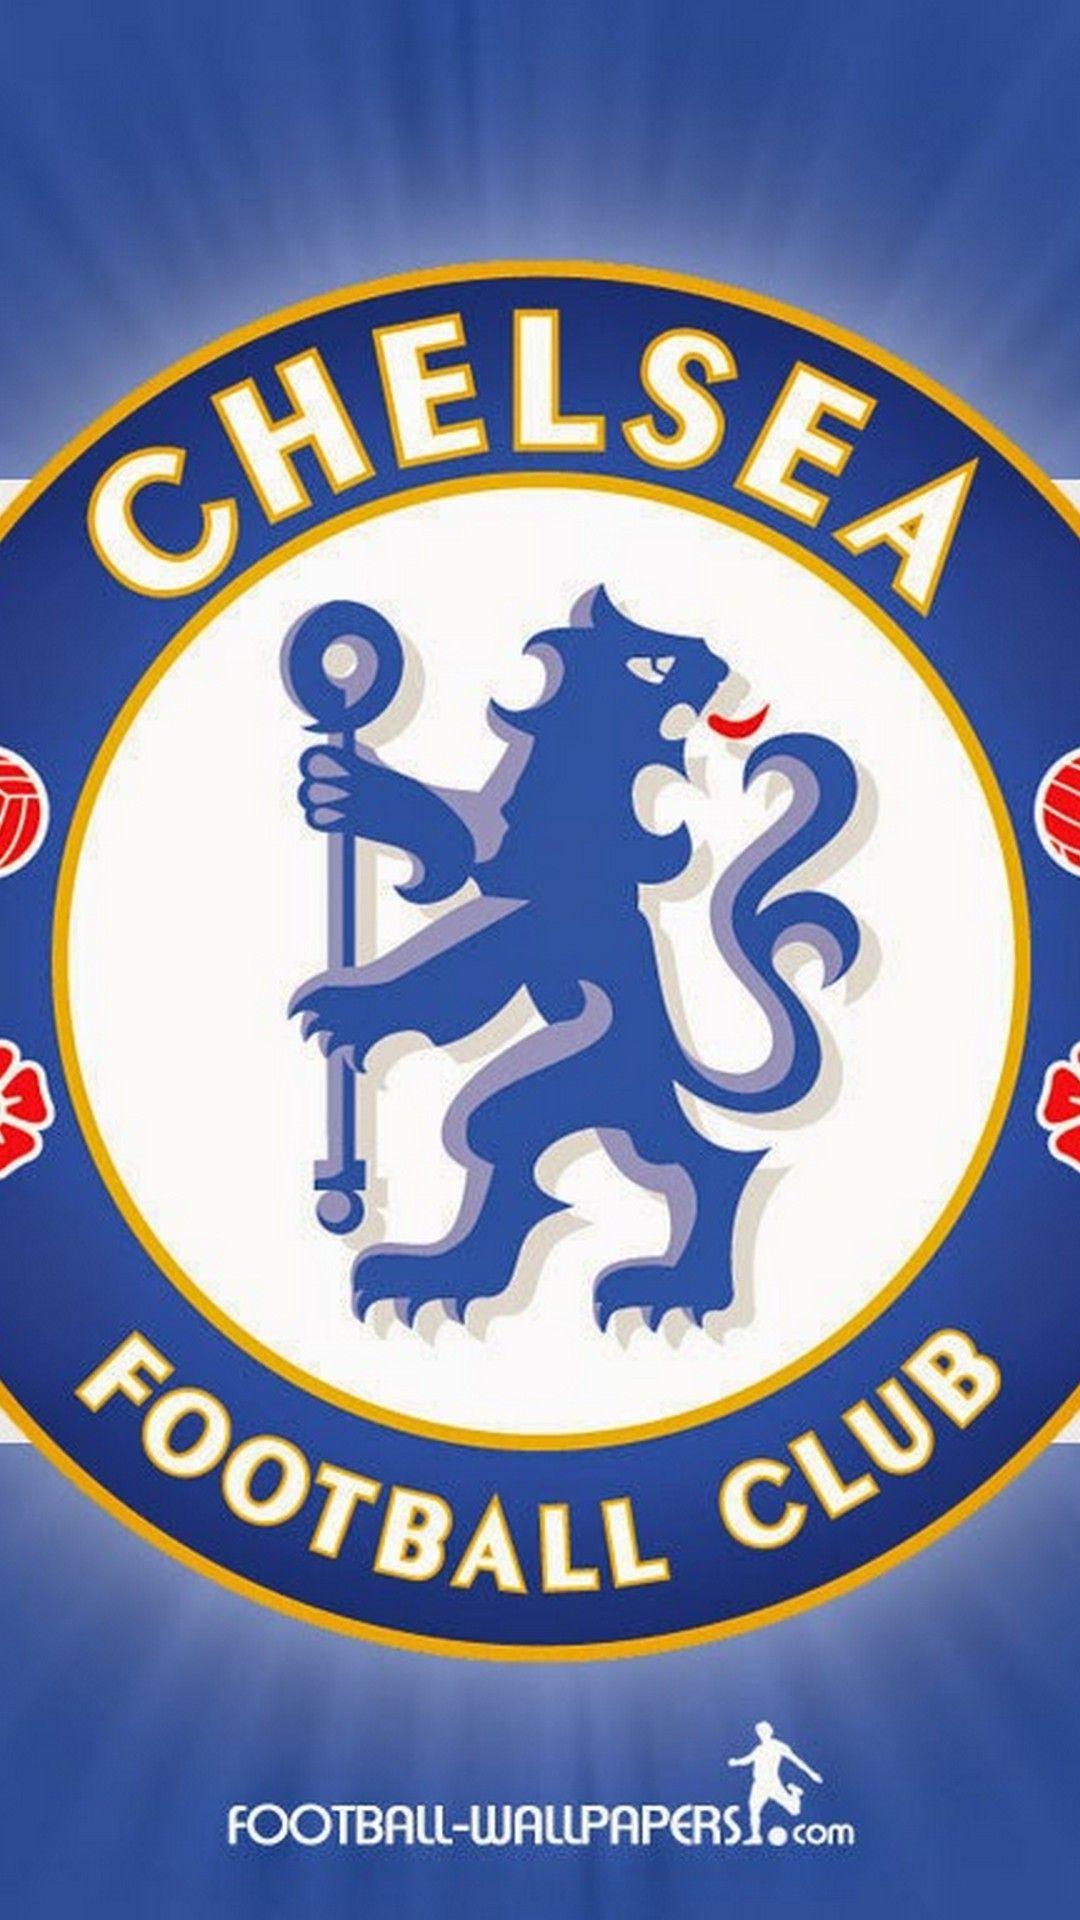 Chelsea Football Club Iphone X Wallpaper Best Wallpaper Hd Chelsea Football Club Wallpapers Chelsea Wallpapers Football Wallpaper